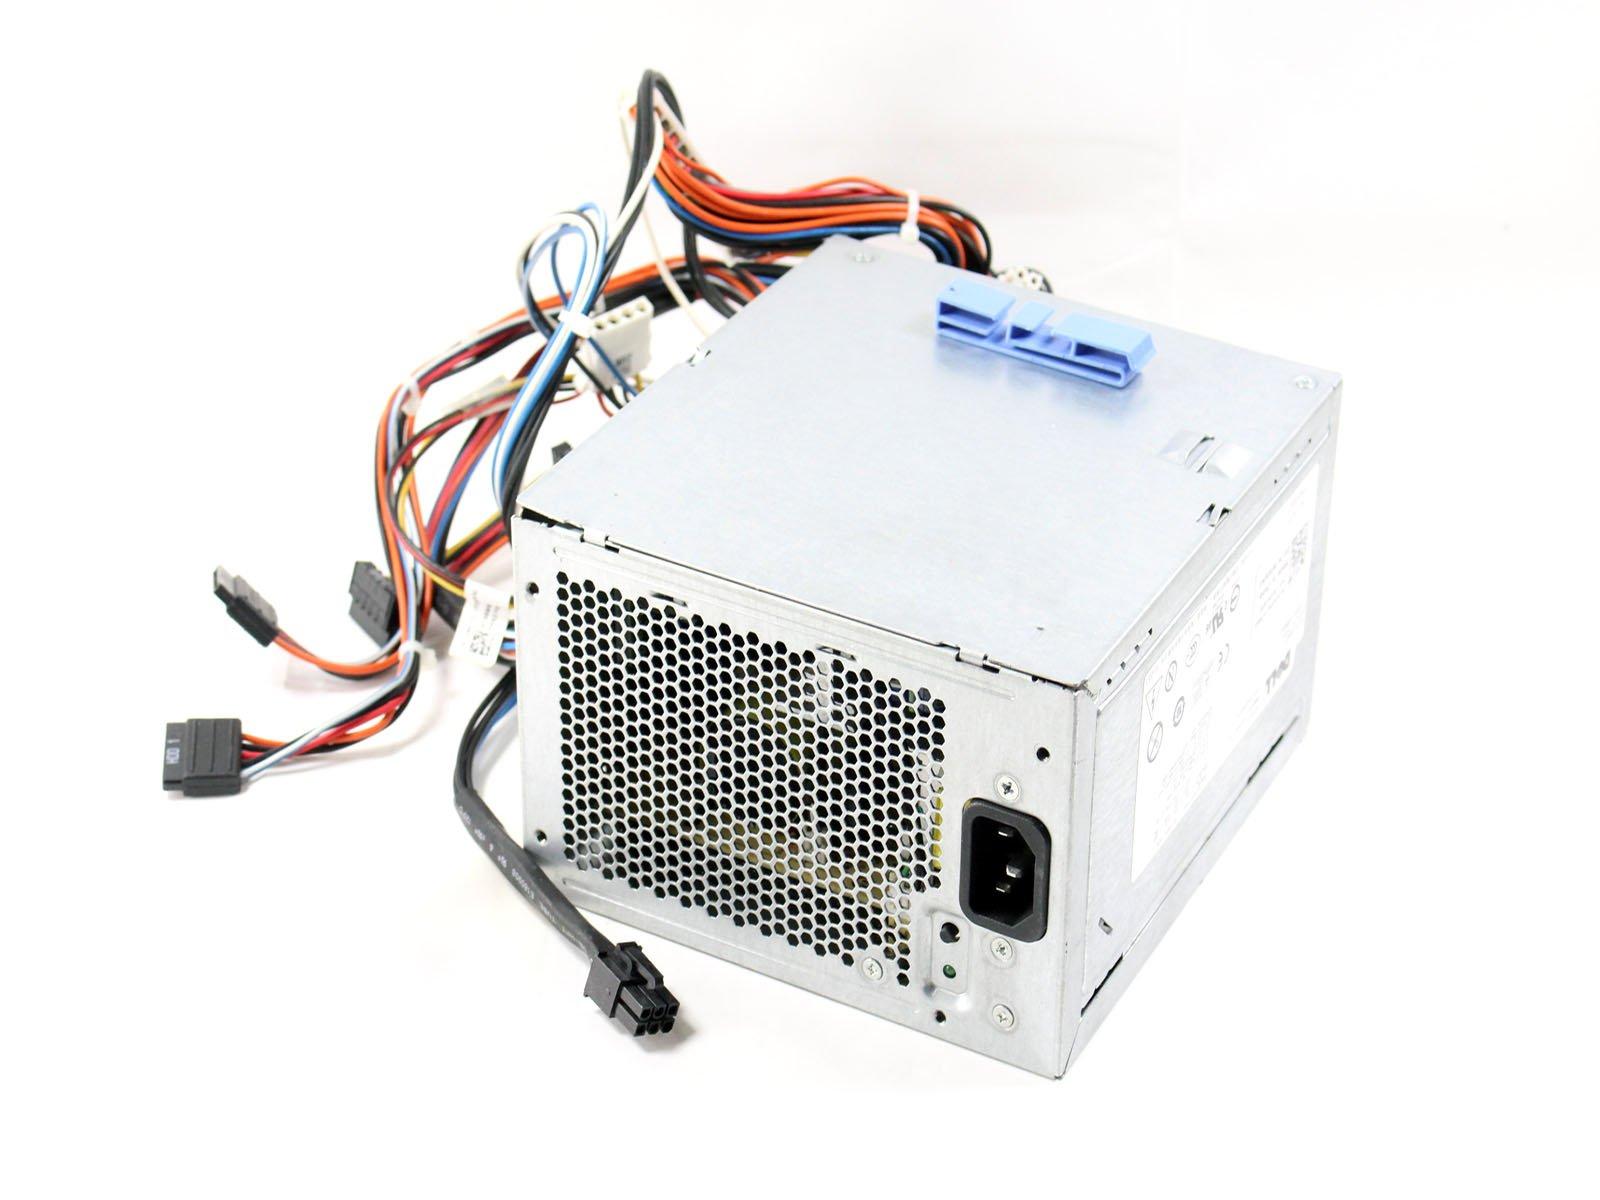 Dell Precision T3500 Workstation PSU 525W Power Supply (6W6M1)